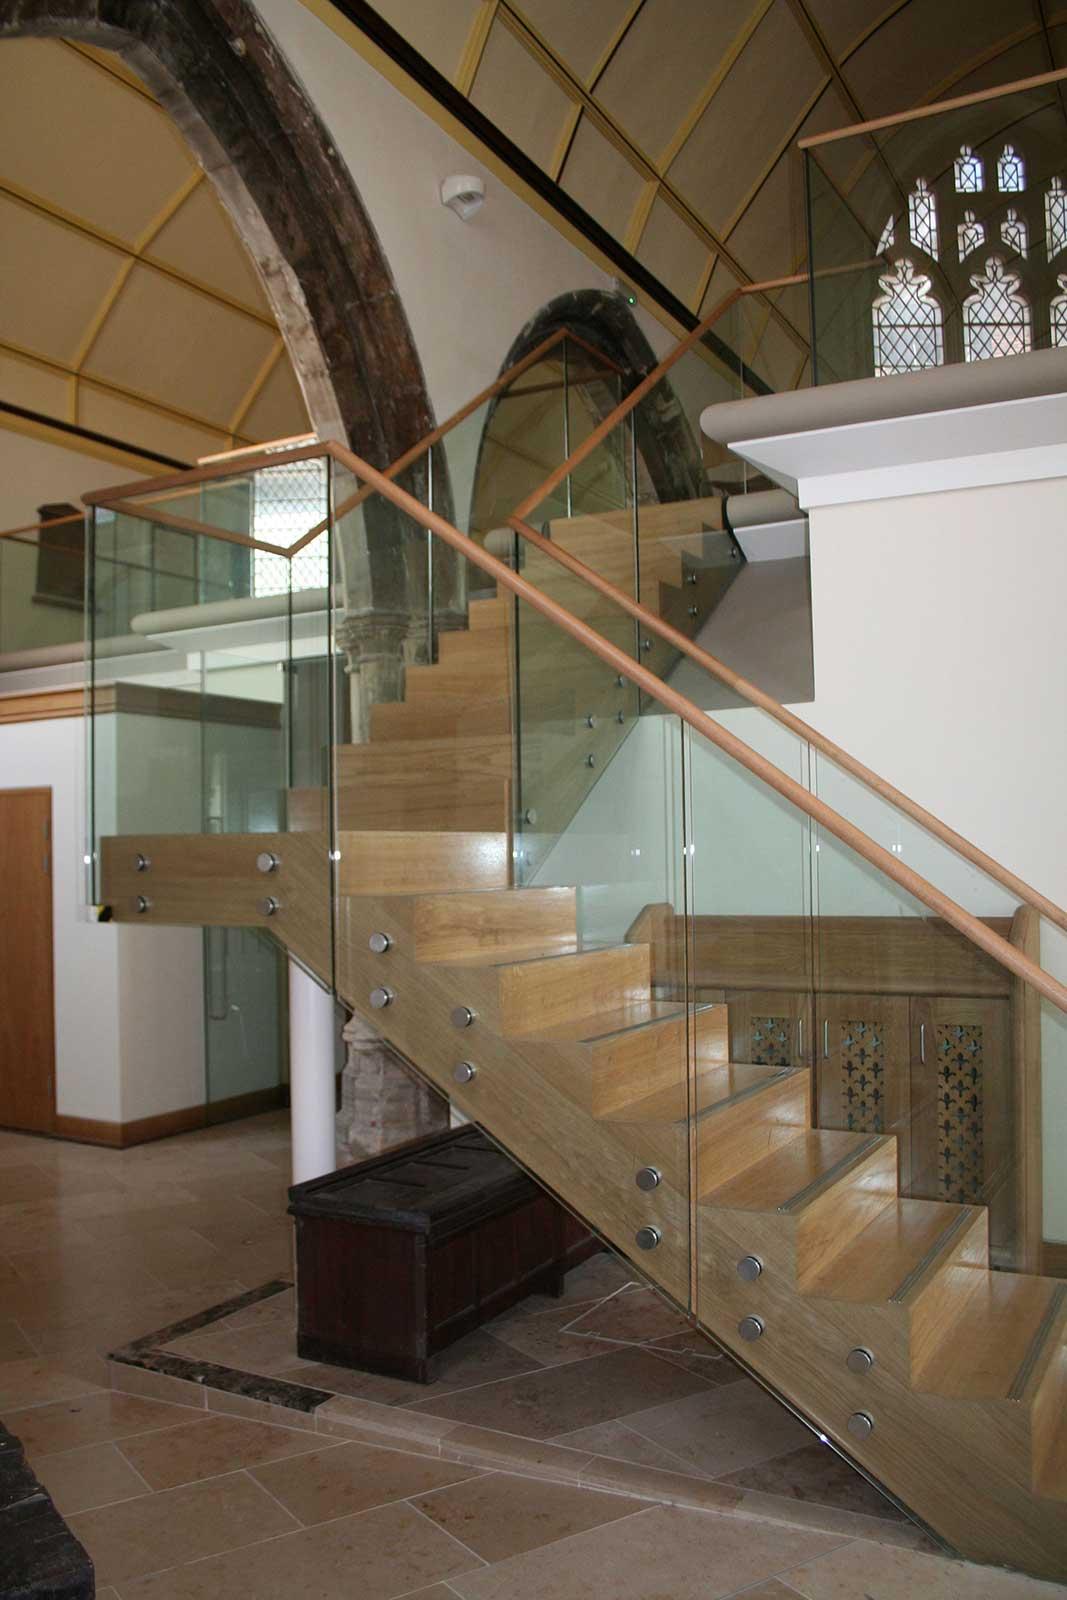 Mezzanine floor with glass balustrades